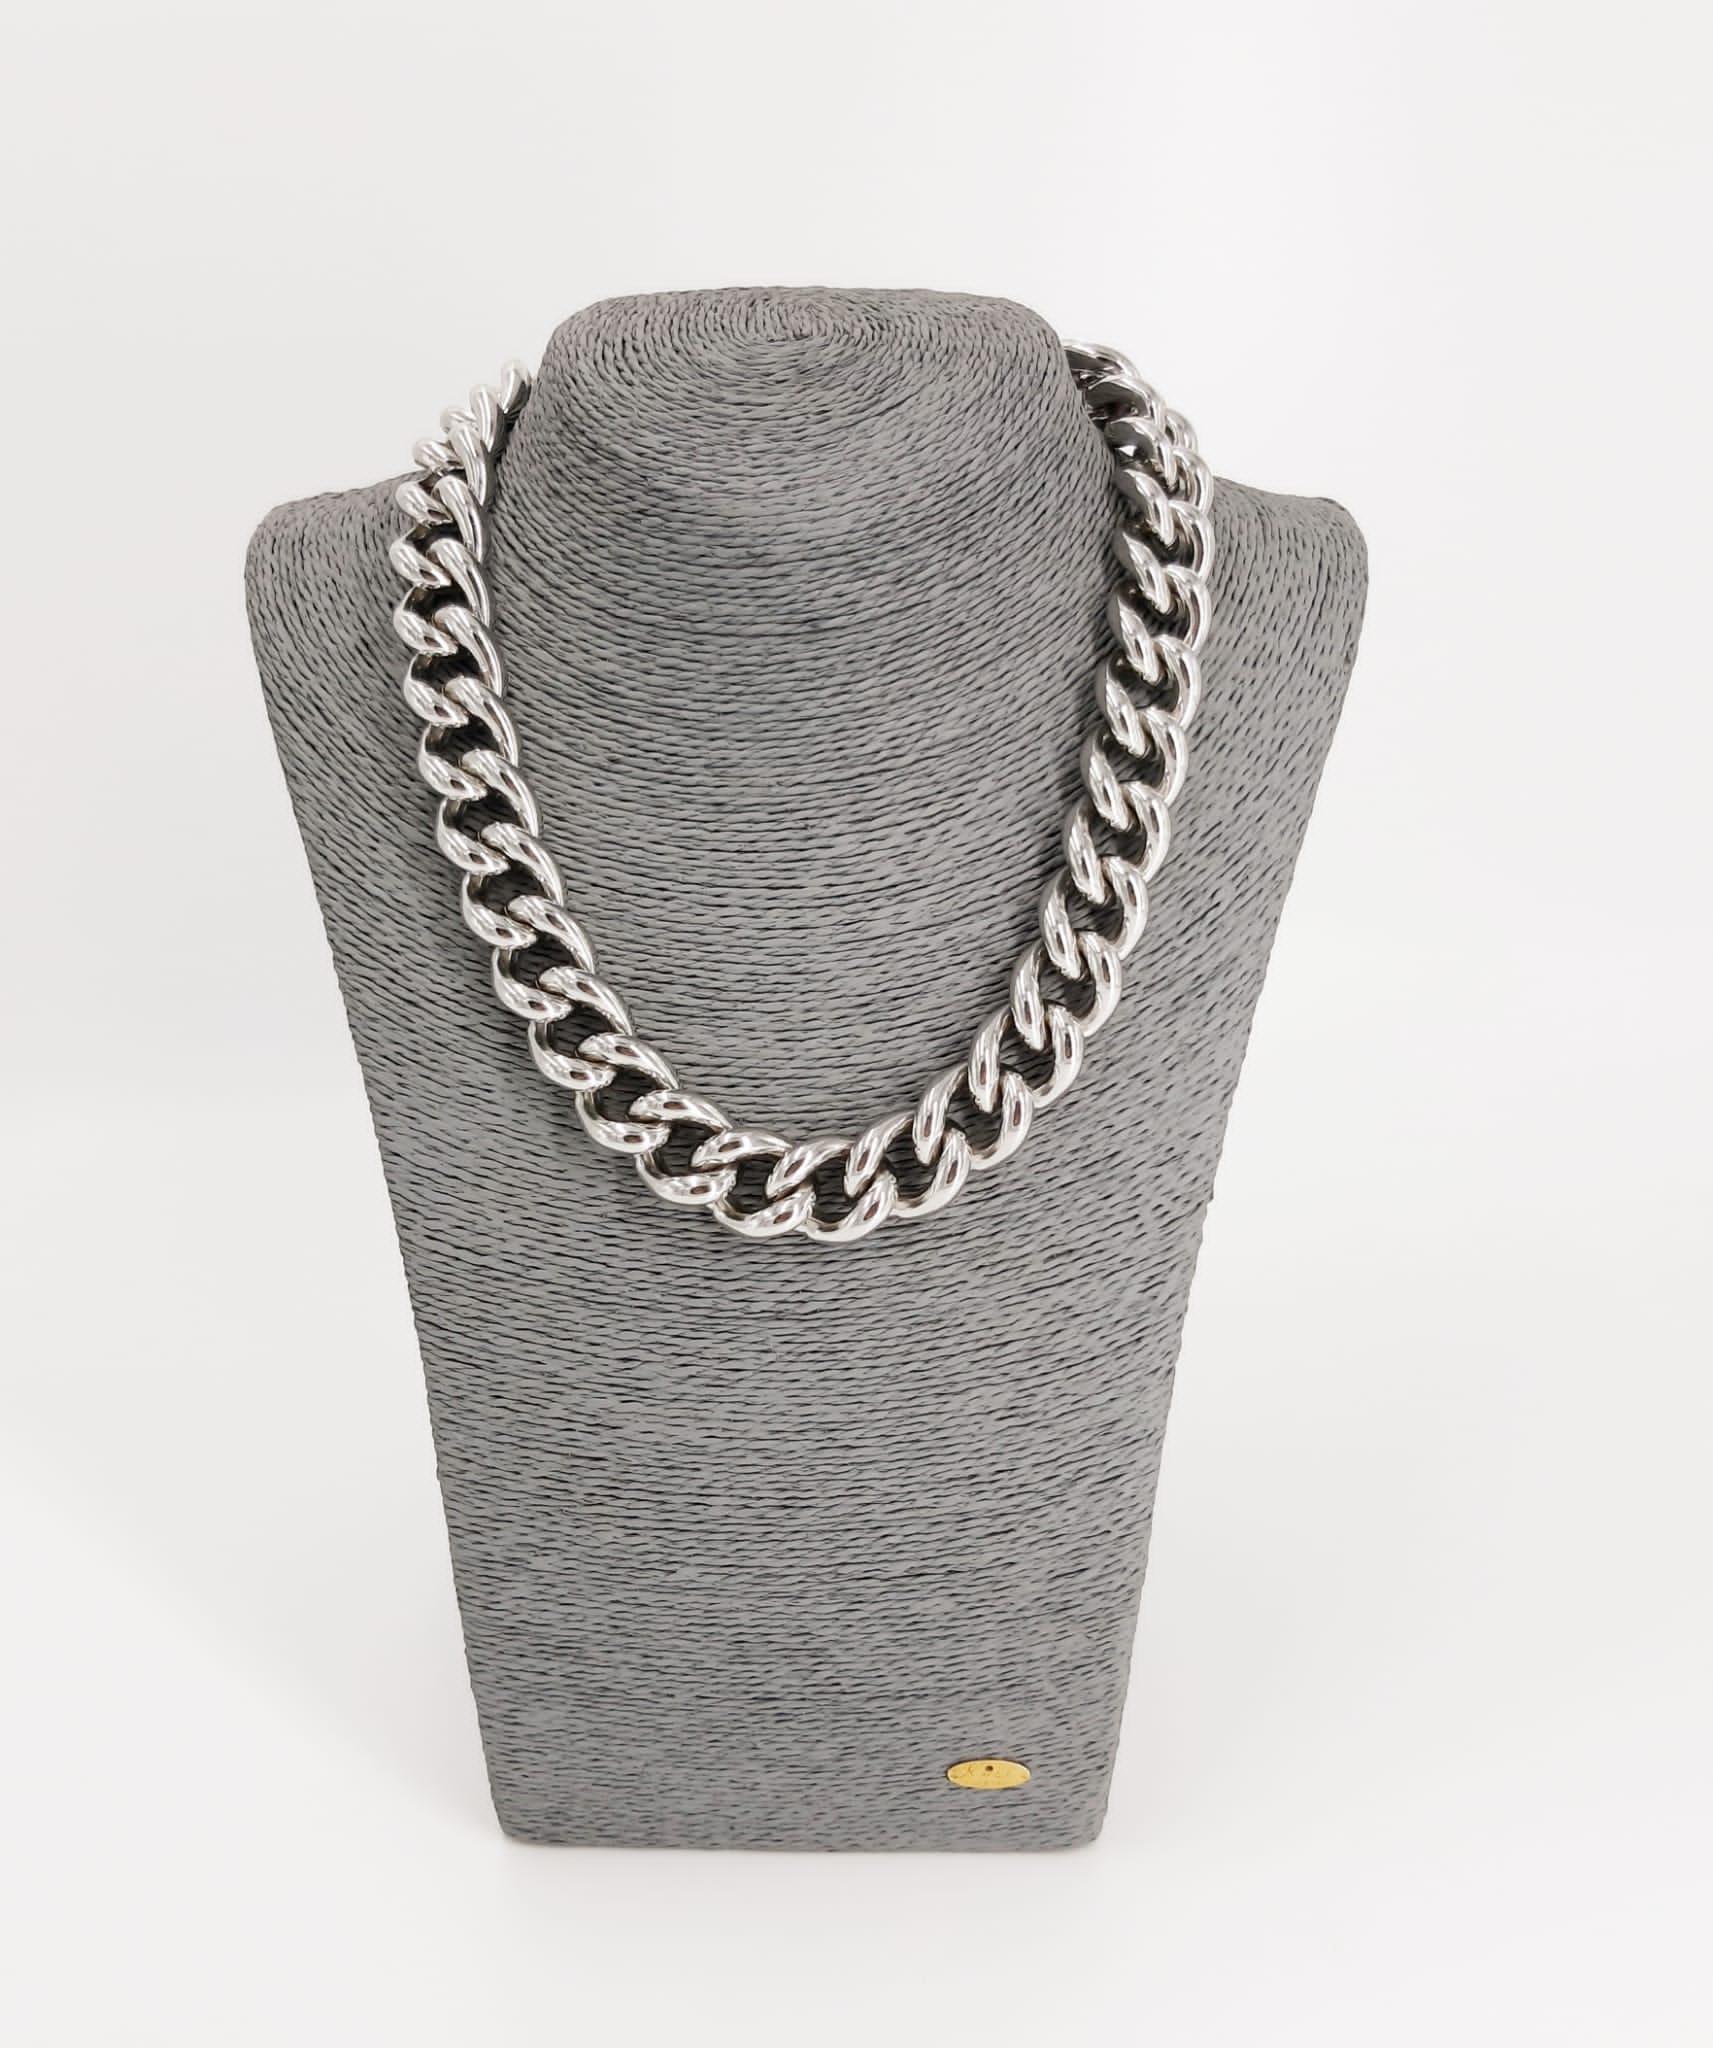 Catena grumetta maglie larghe oro bianco Francesca Bianchi Design